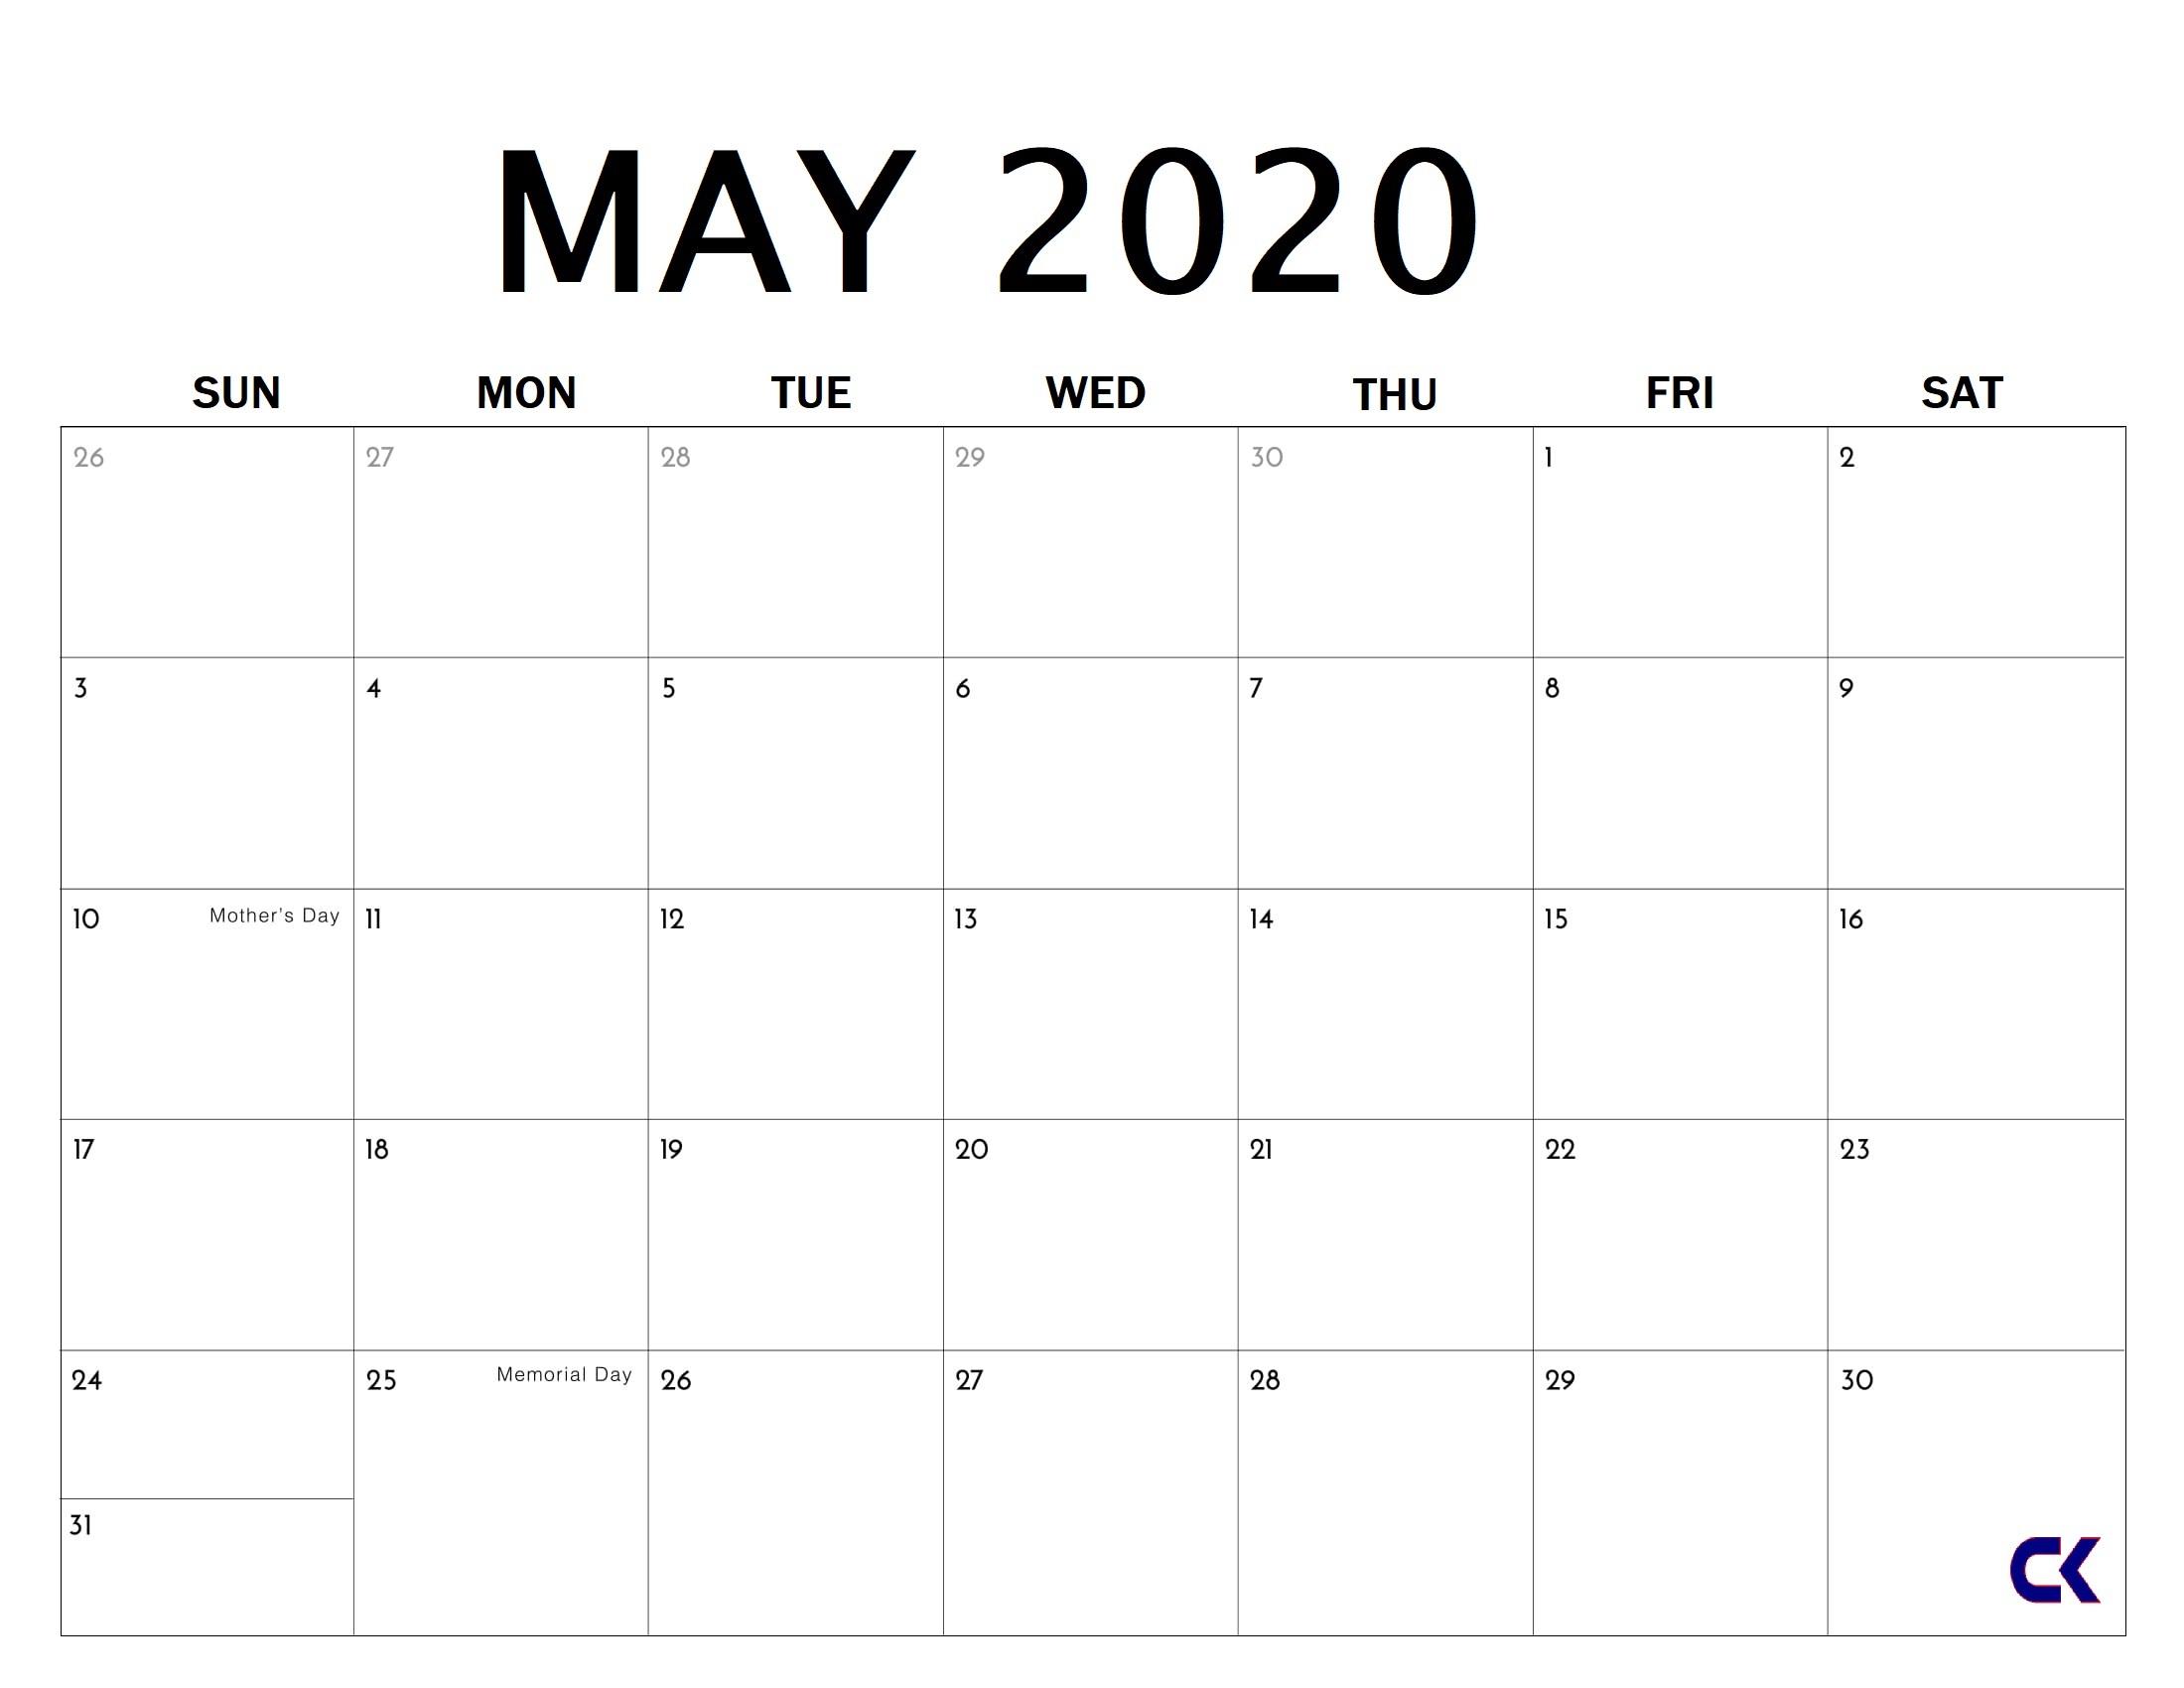 Printable May 2020 Calendar - Calendar-Kart